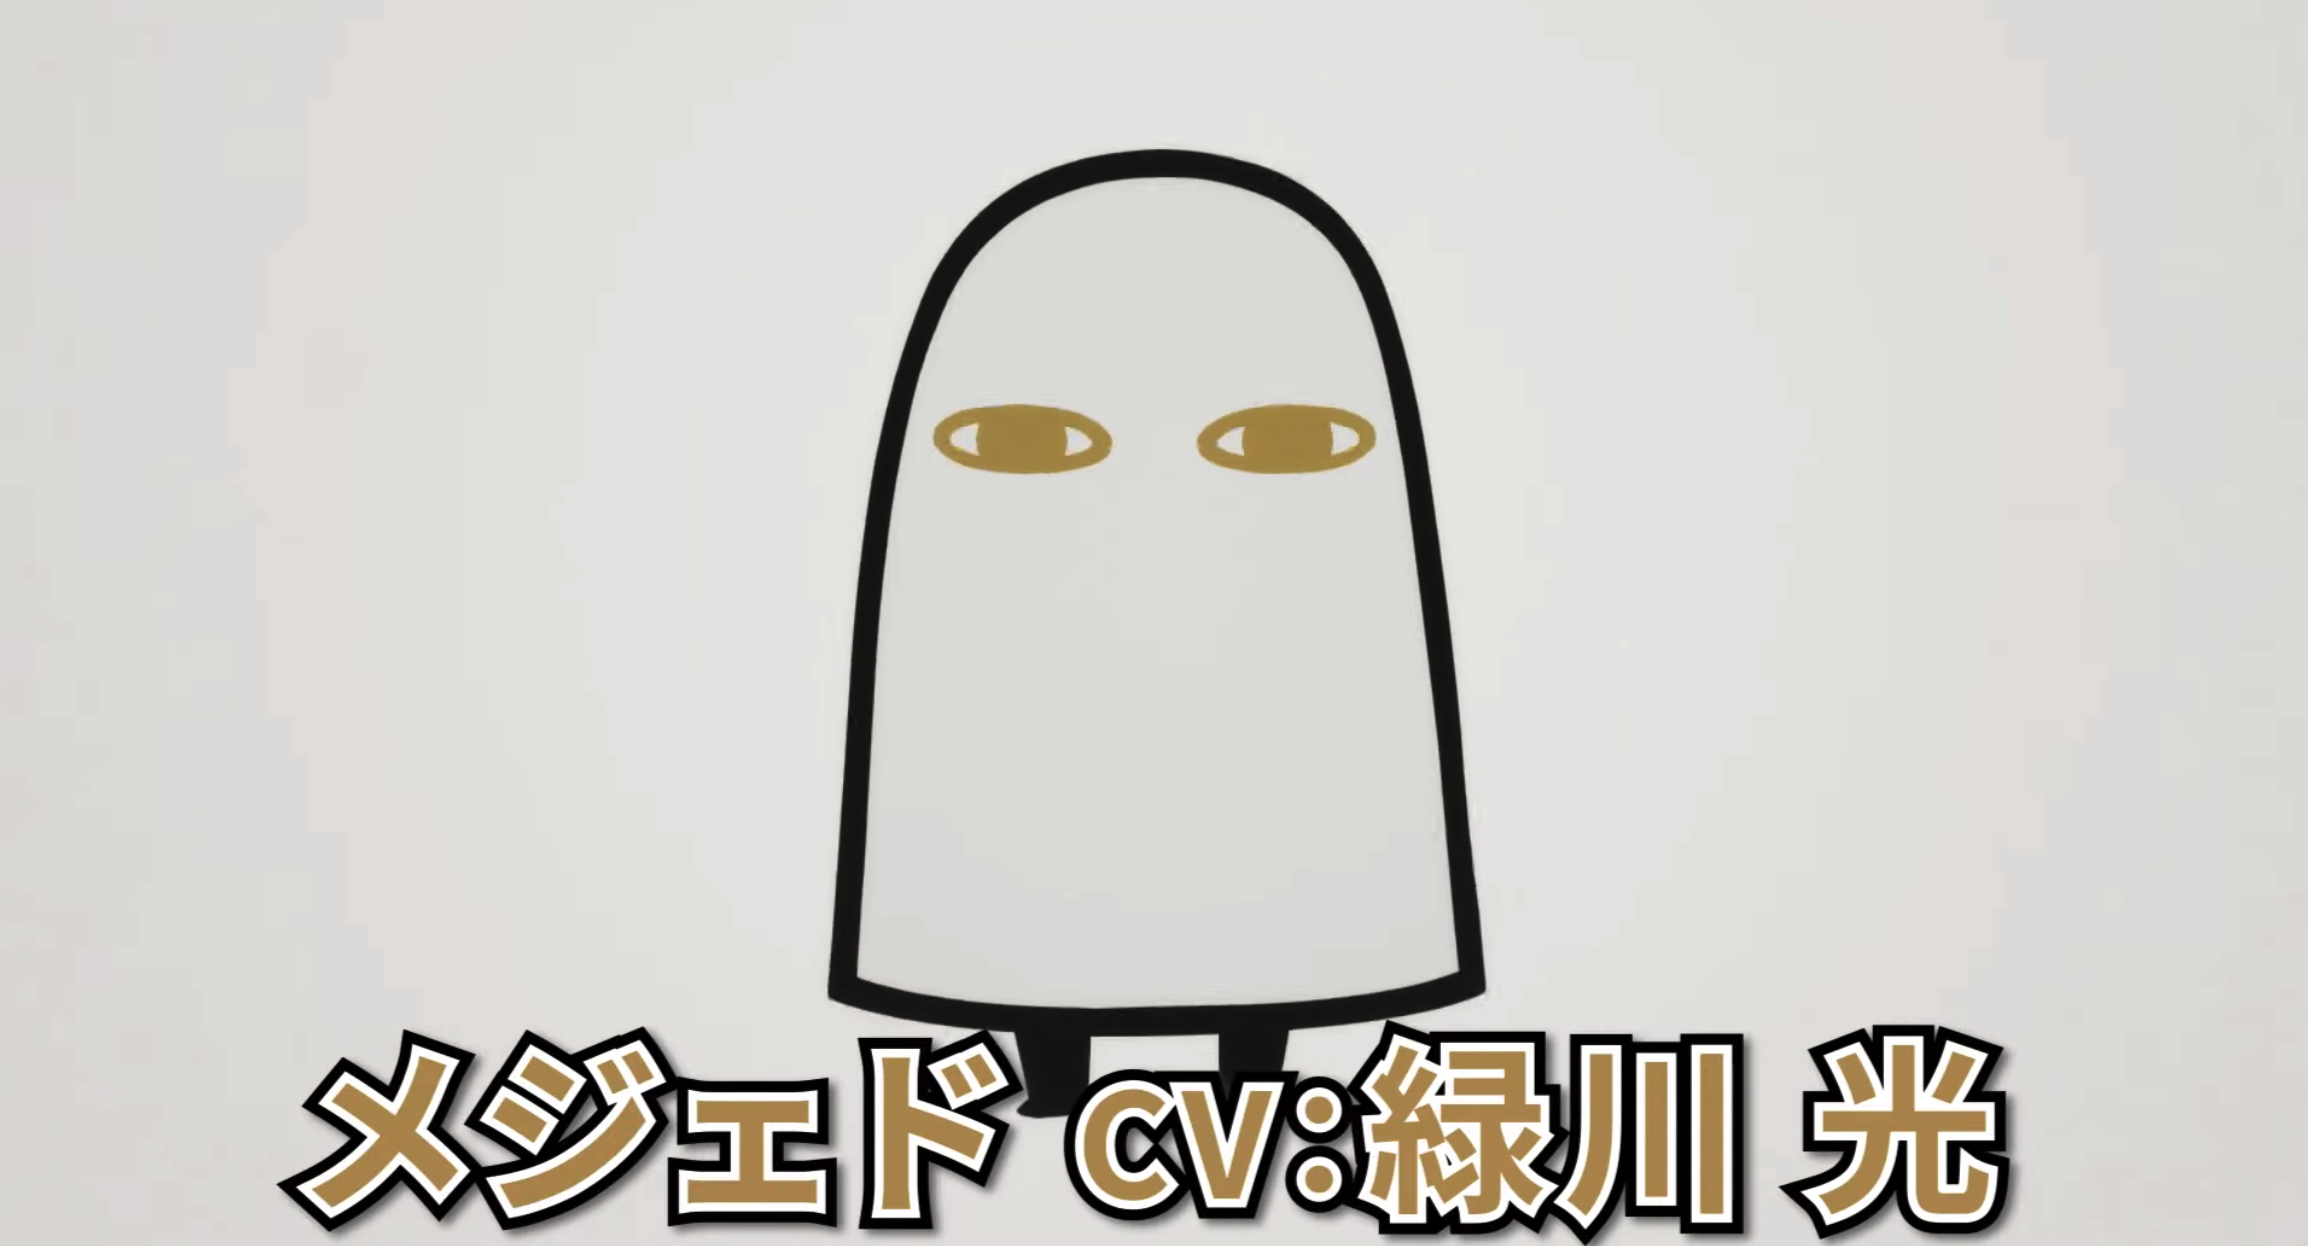 【AcFun独播】《埃及神明们的日常》梅杰德 角色PV